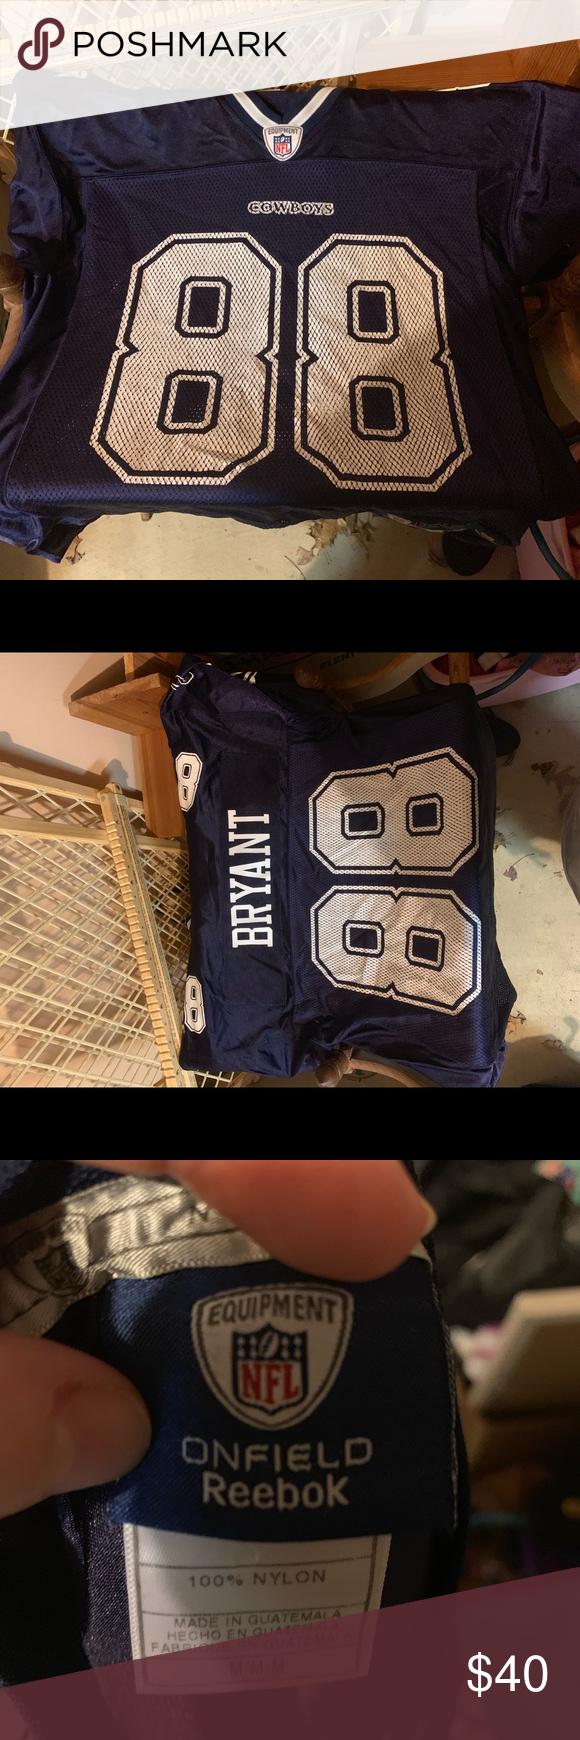 Dallas Cowboys Bryant Jersey Dez Bryant Excellent condition Shirts #dezbryantjersey Dallas Cowboys Bryant Jersey Dez Bryant Excellent condition Shirts #dezbryant